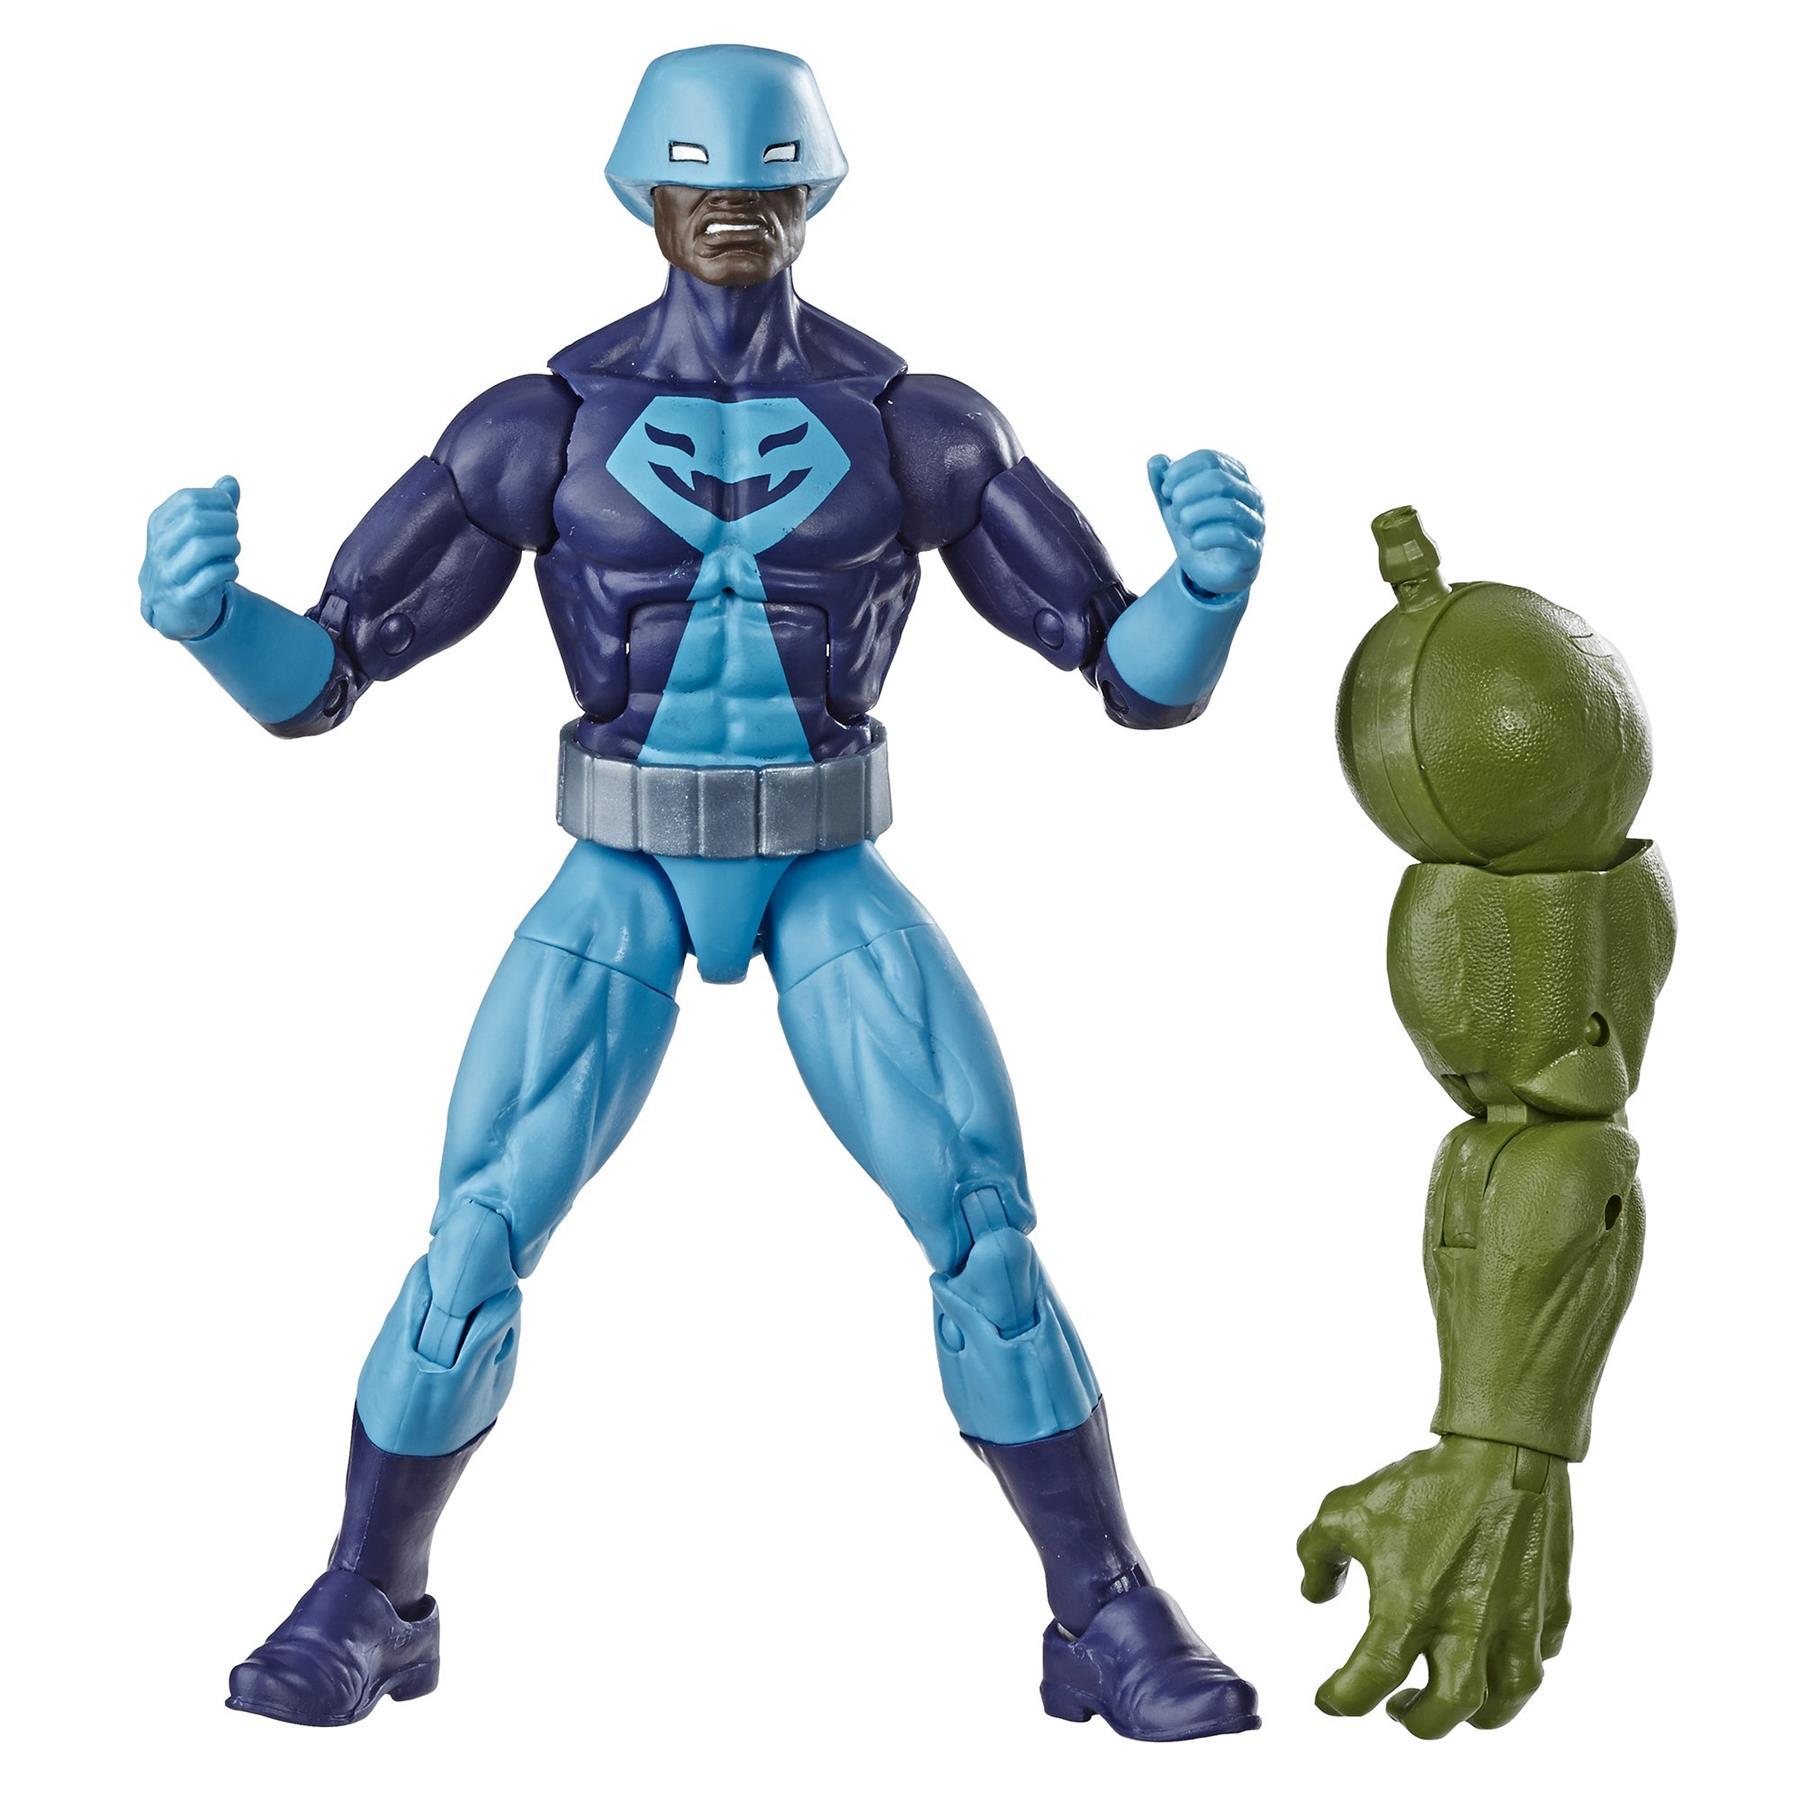 Marvel-Legends-Avengers-6-034-Action-Figures-Hulk-BAF thumbnail 9